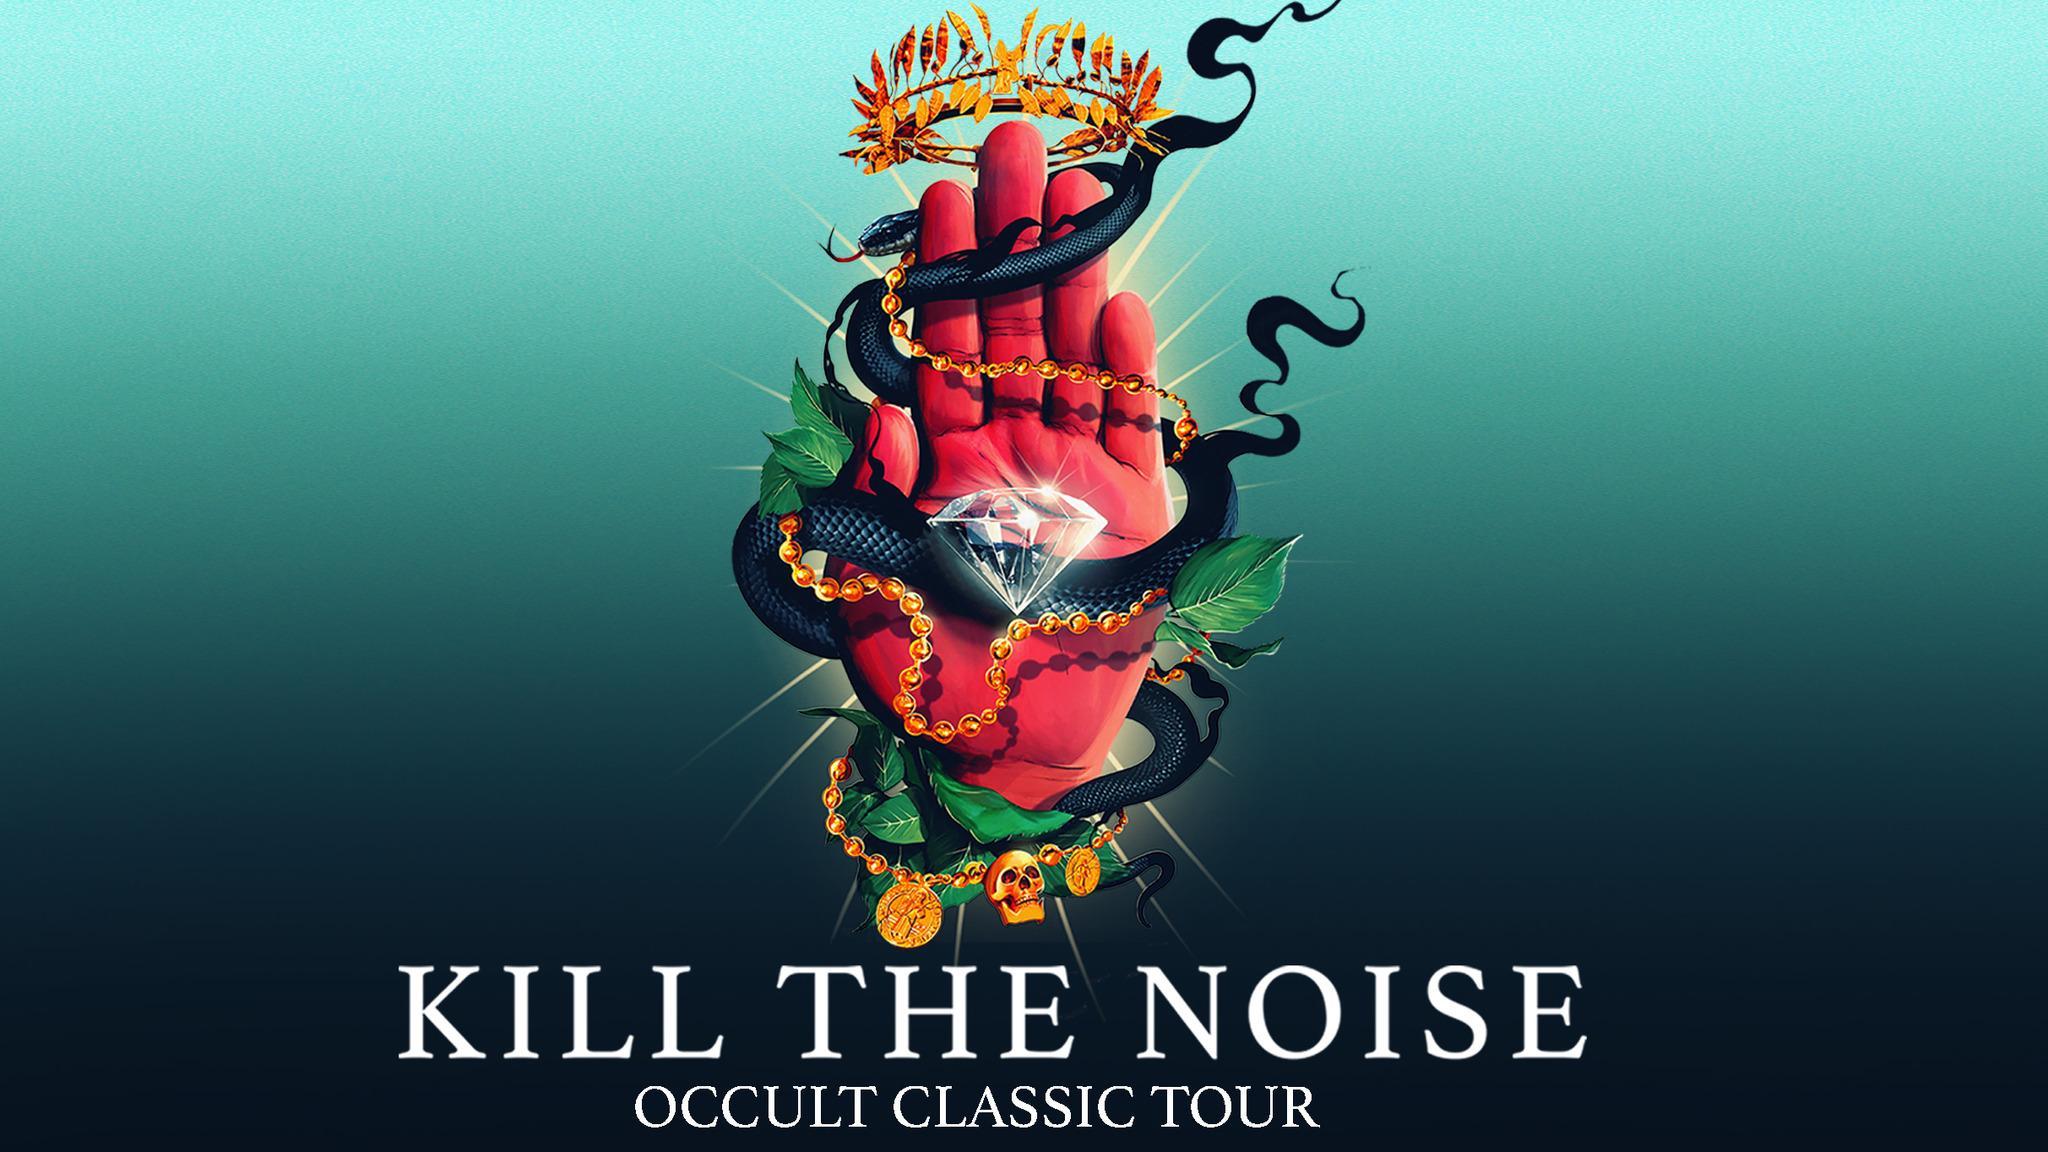 Kill the Noise at Washington Pavilion of Arts & Science